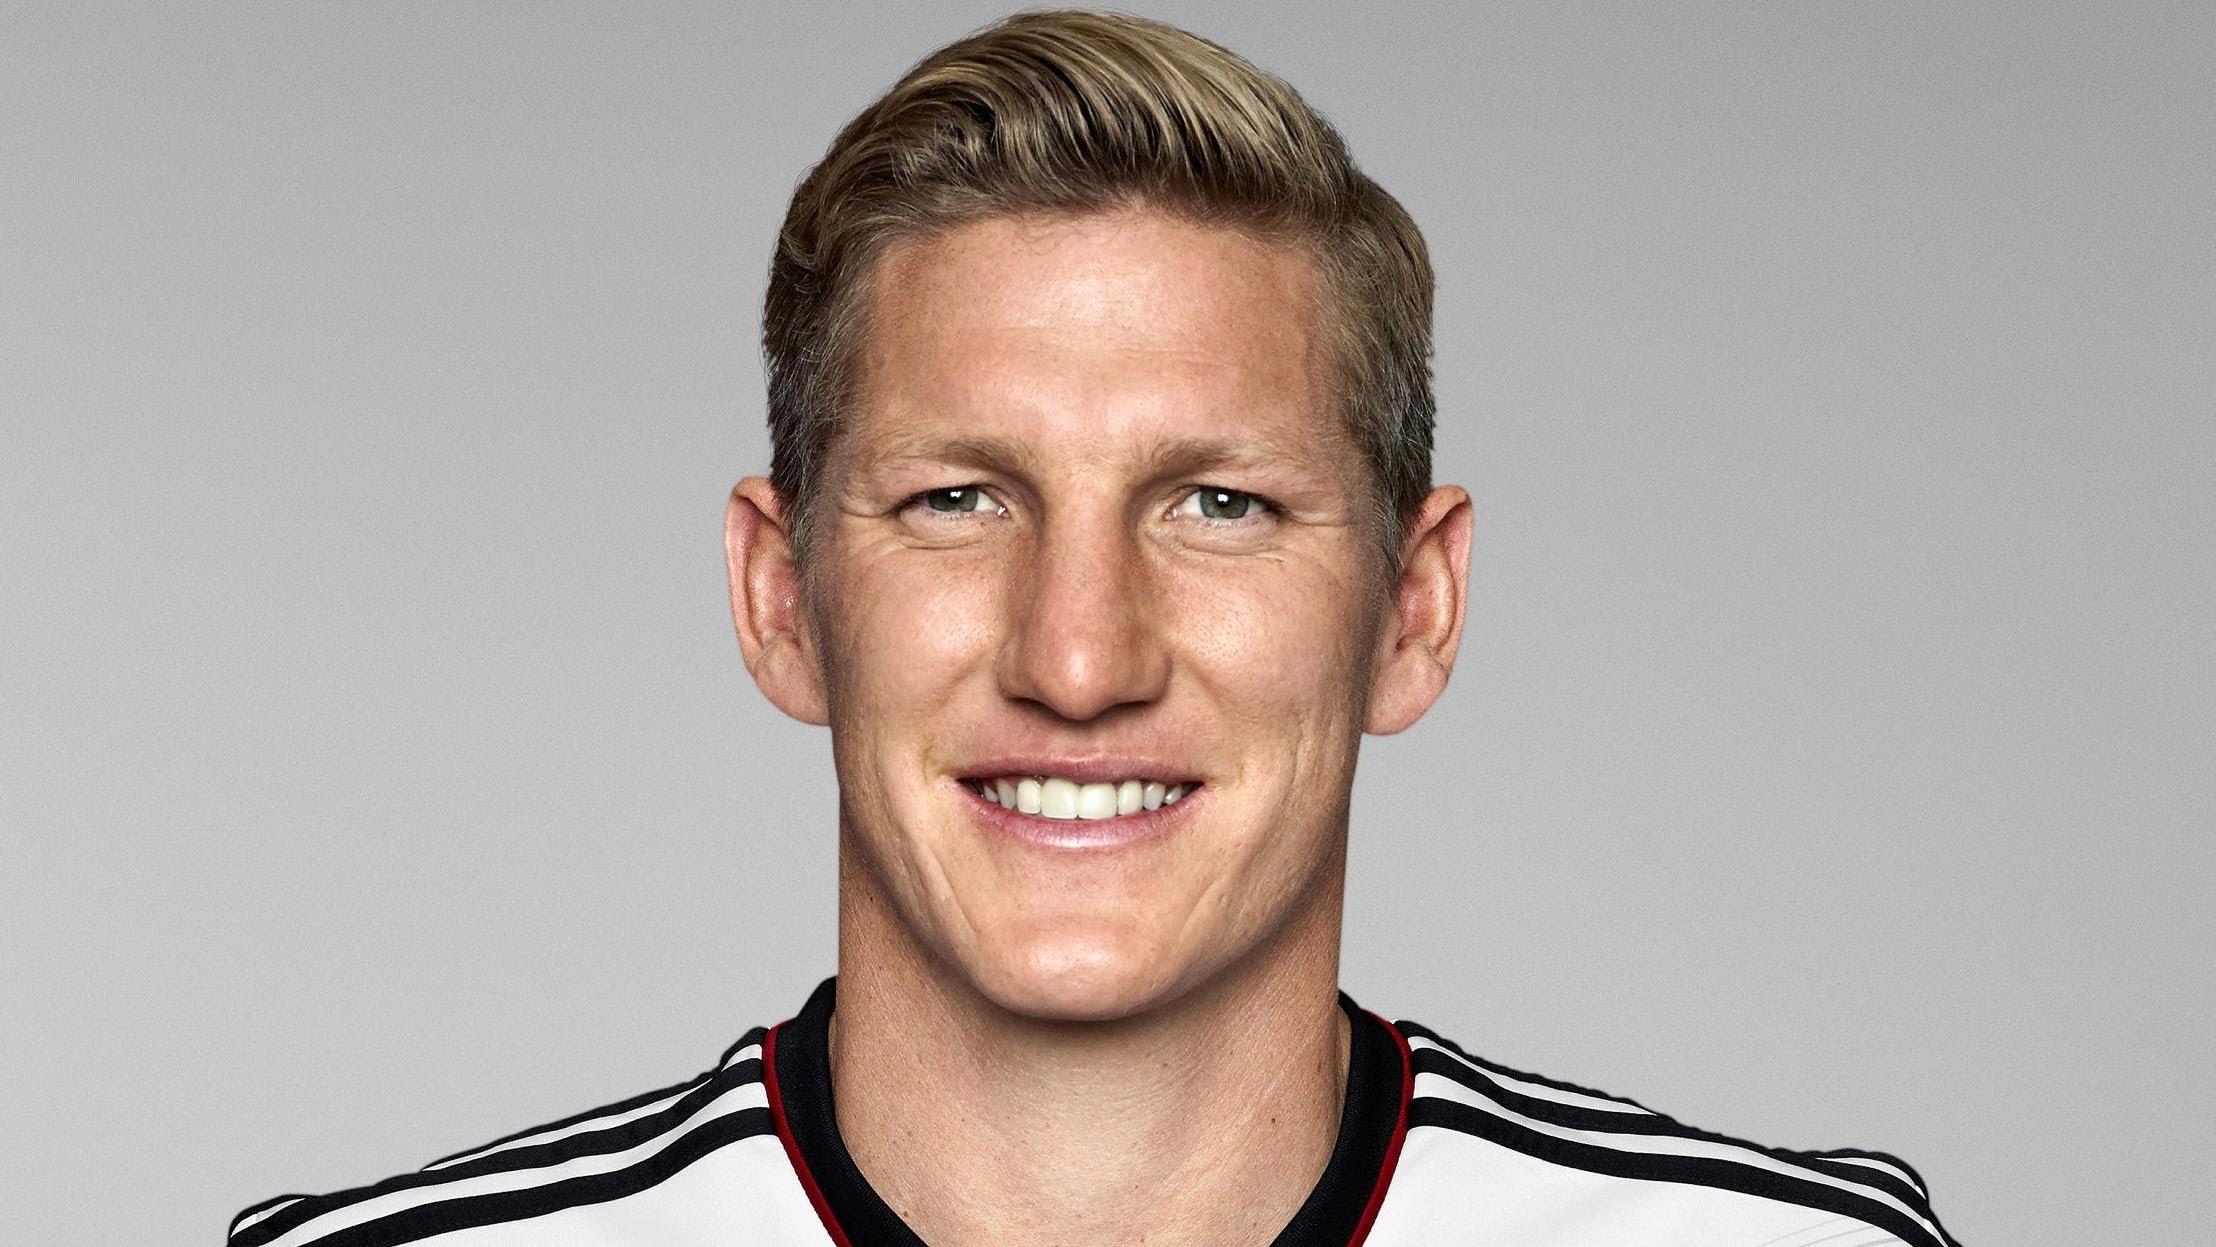 ¿Cuánto mide Bastian Schweinsteiger? - Real height Bastian